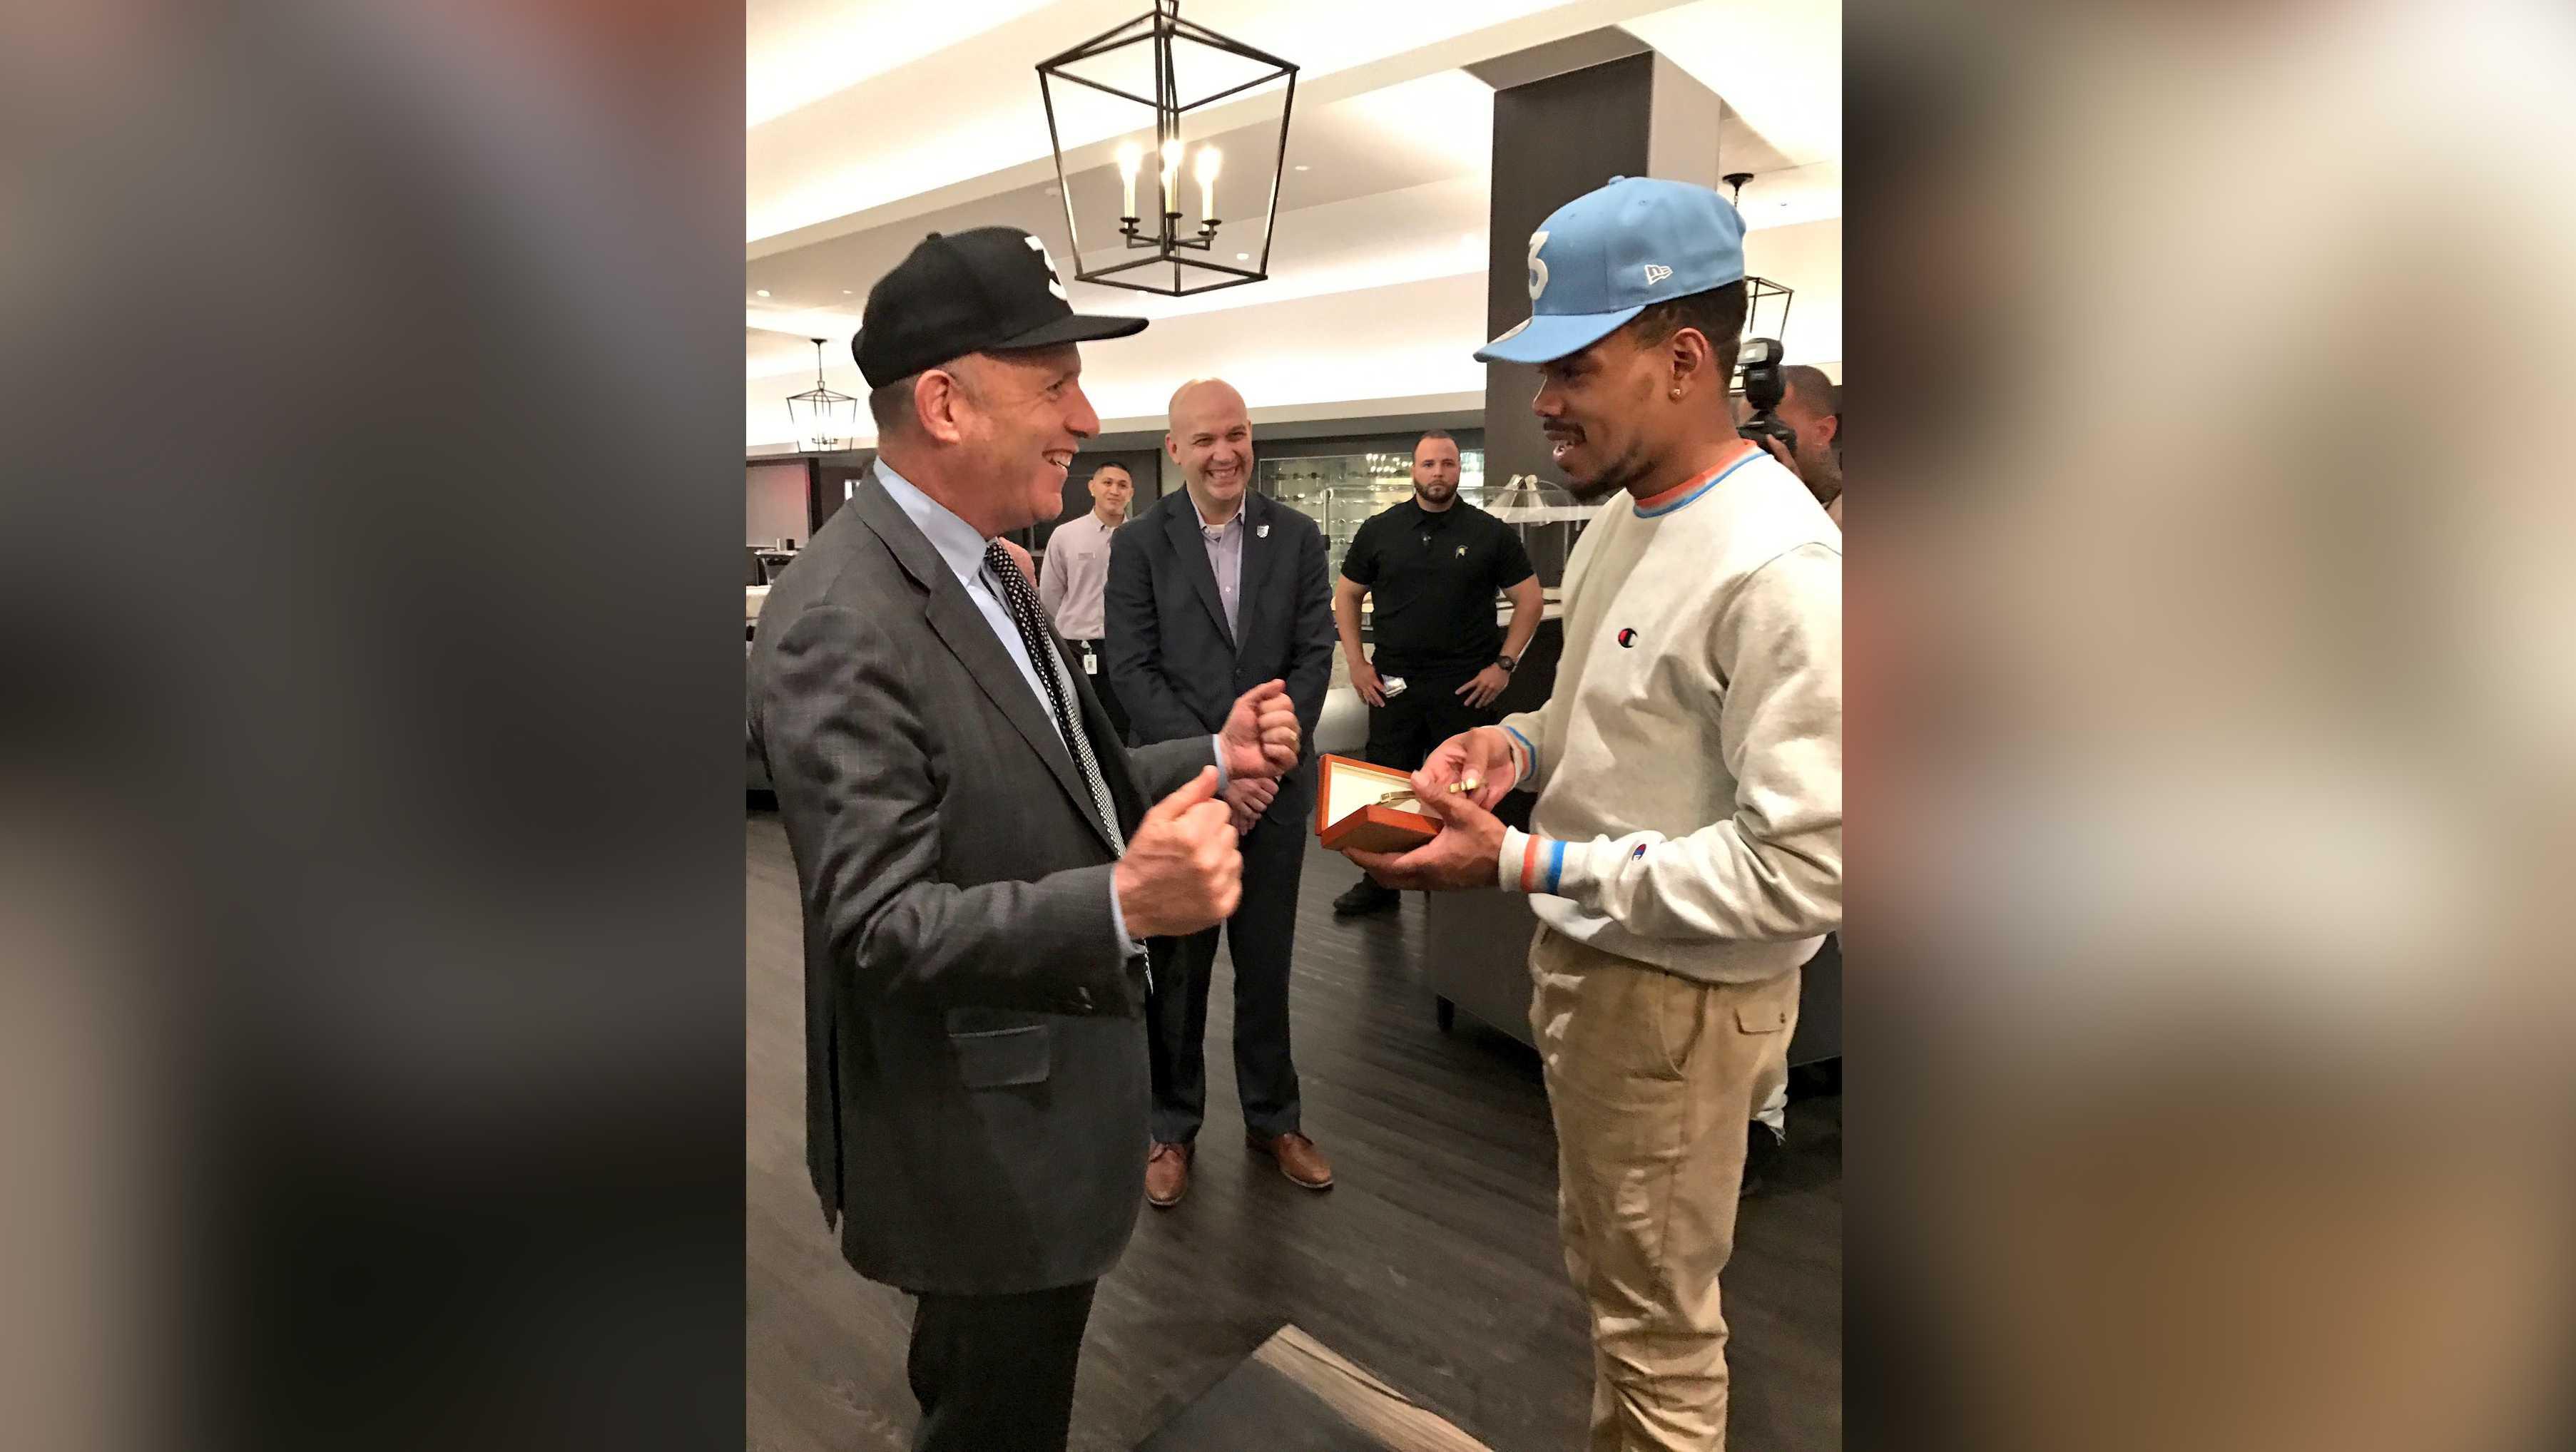 Sacramento Mayor Darrell Steinberg gave Chance the Rapper a key to the city on Thursday, April 27, 2017.